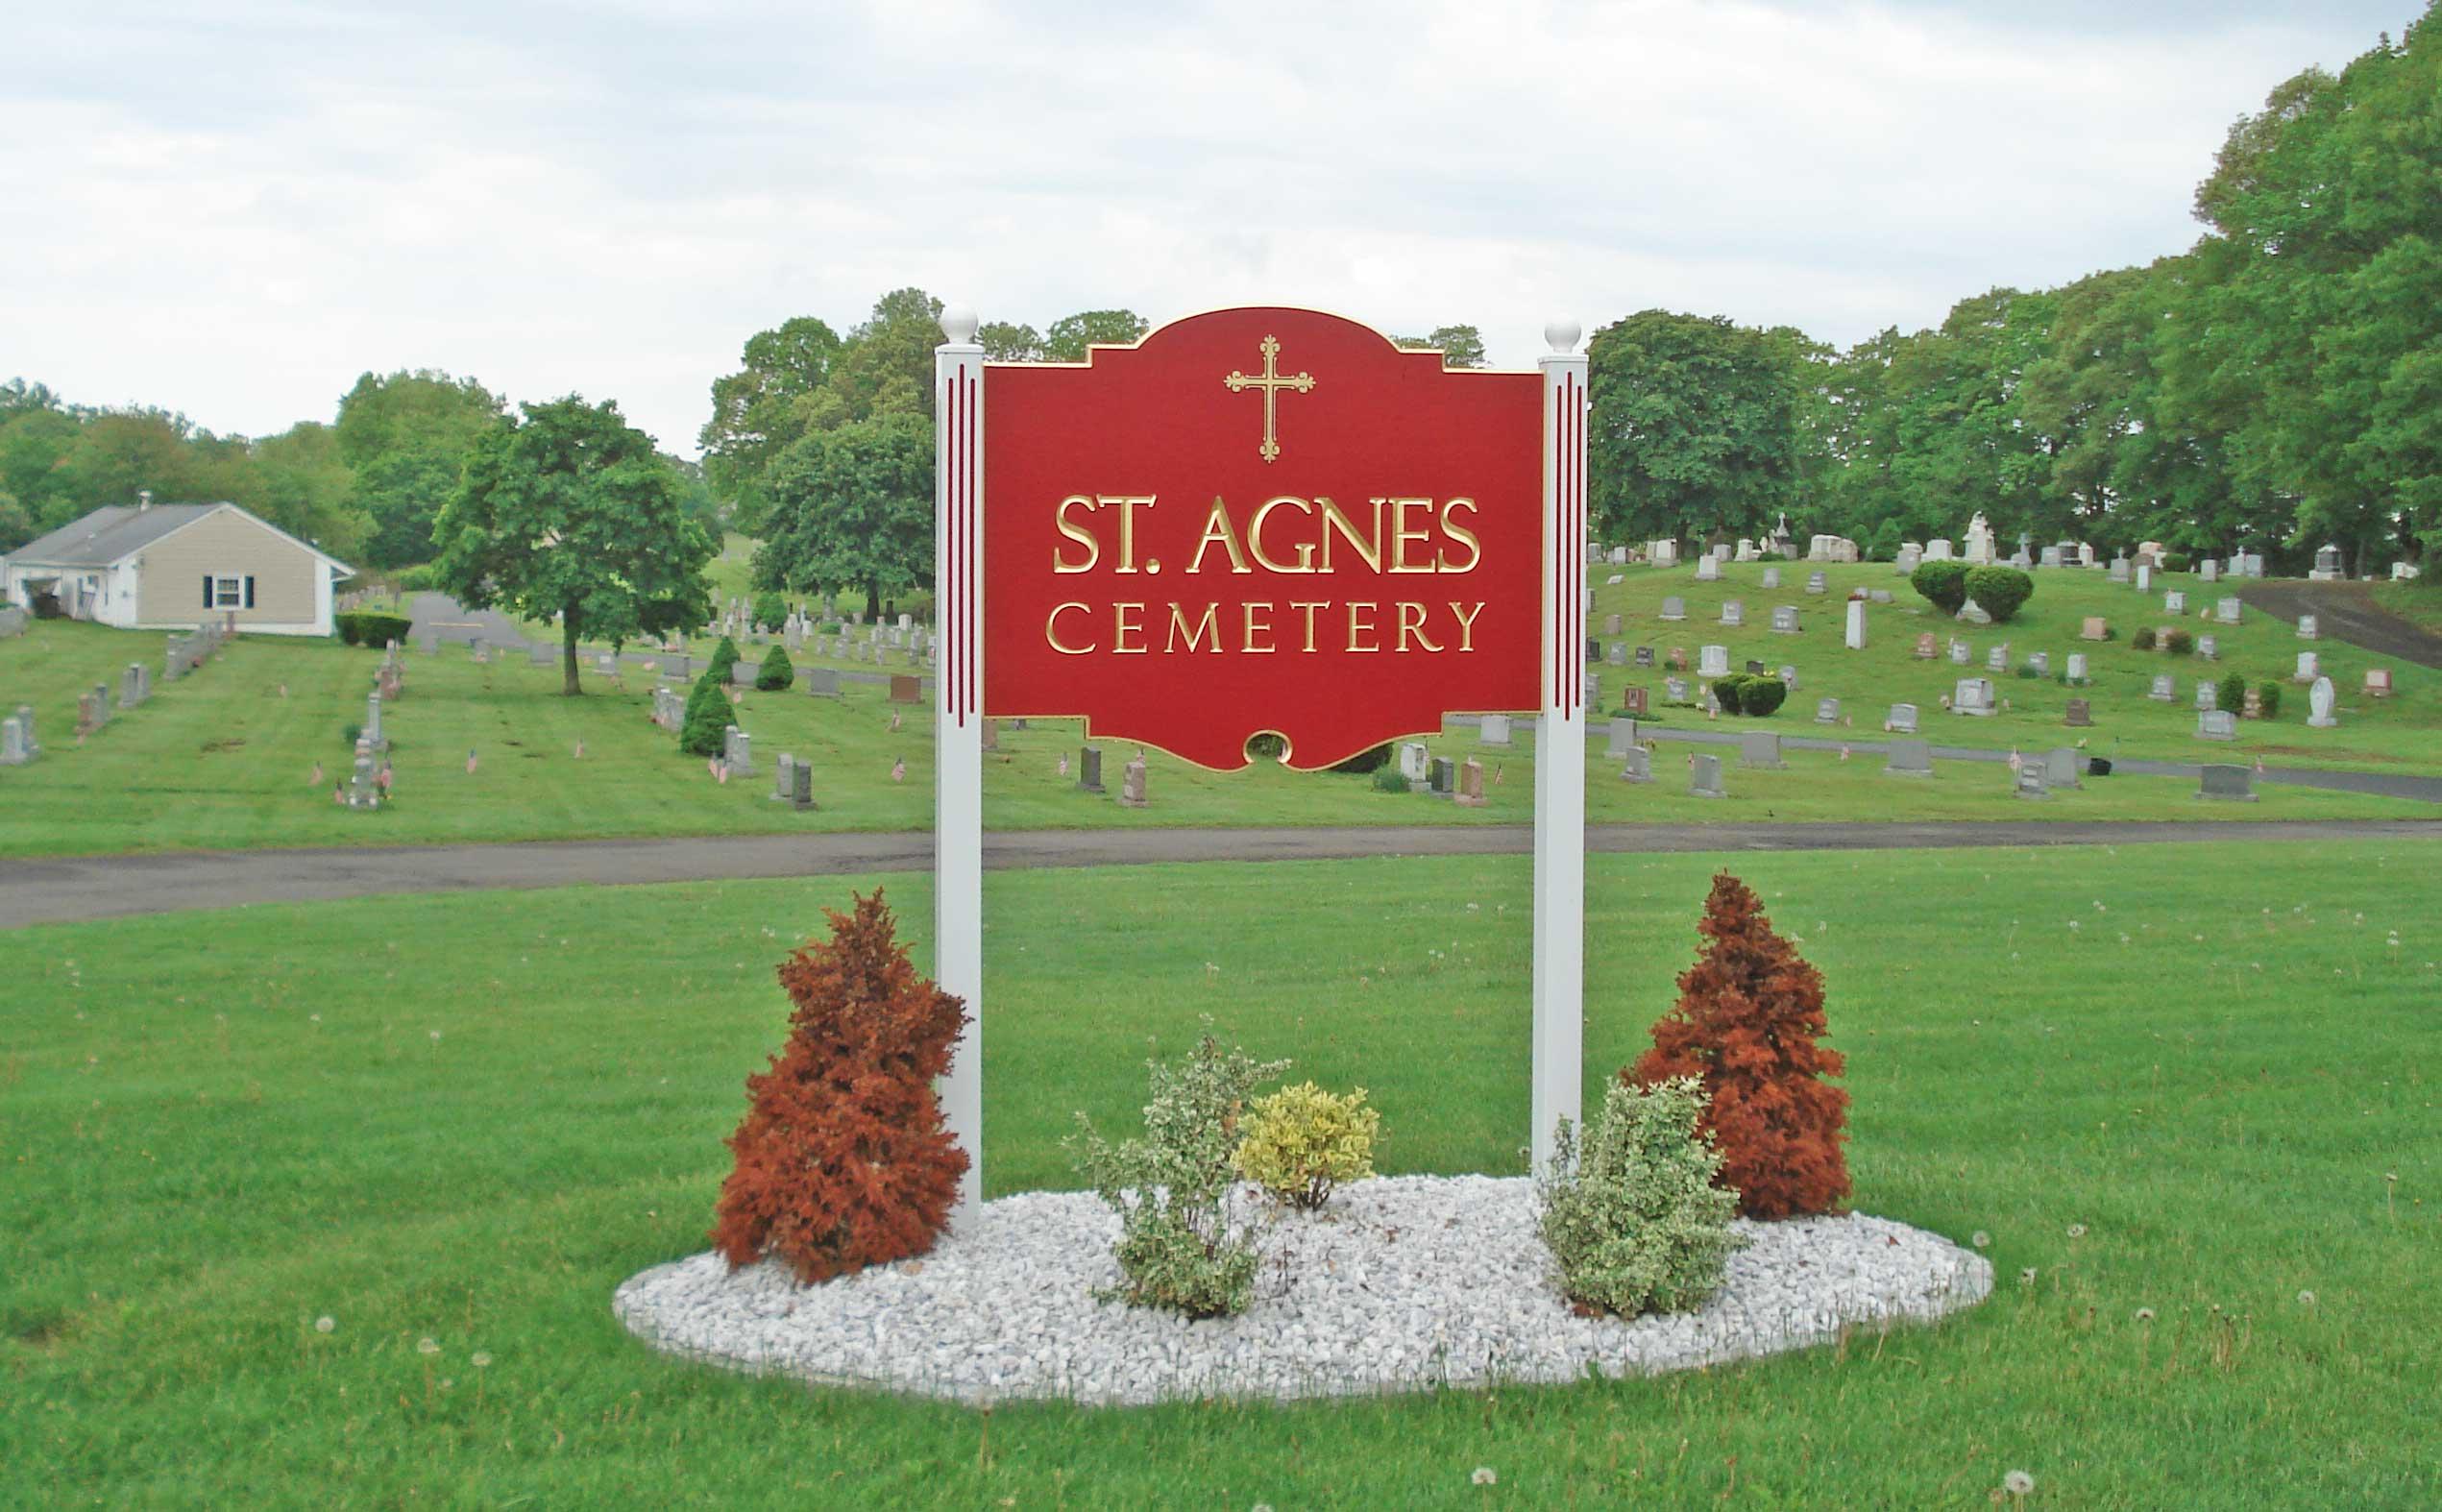 St. Agnes Cemetery